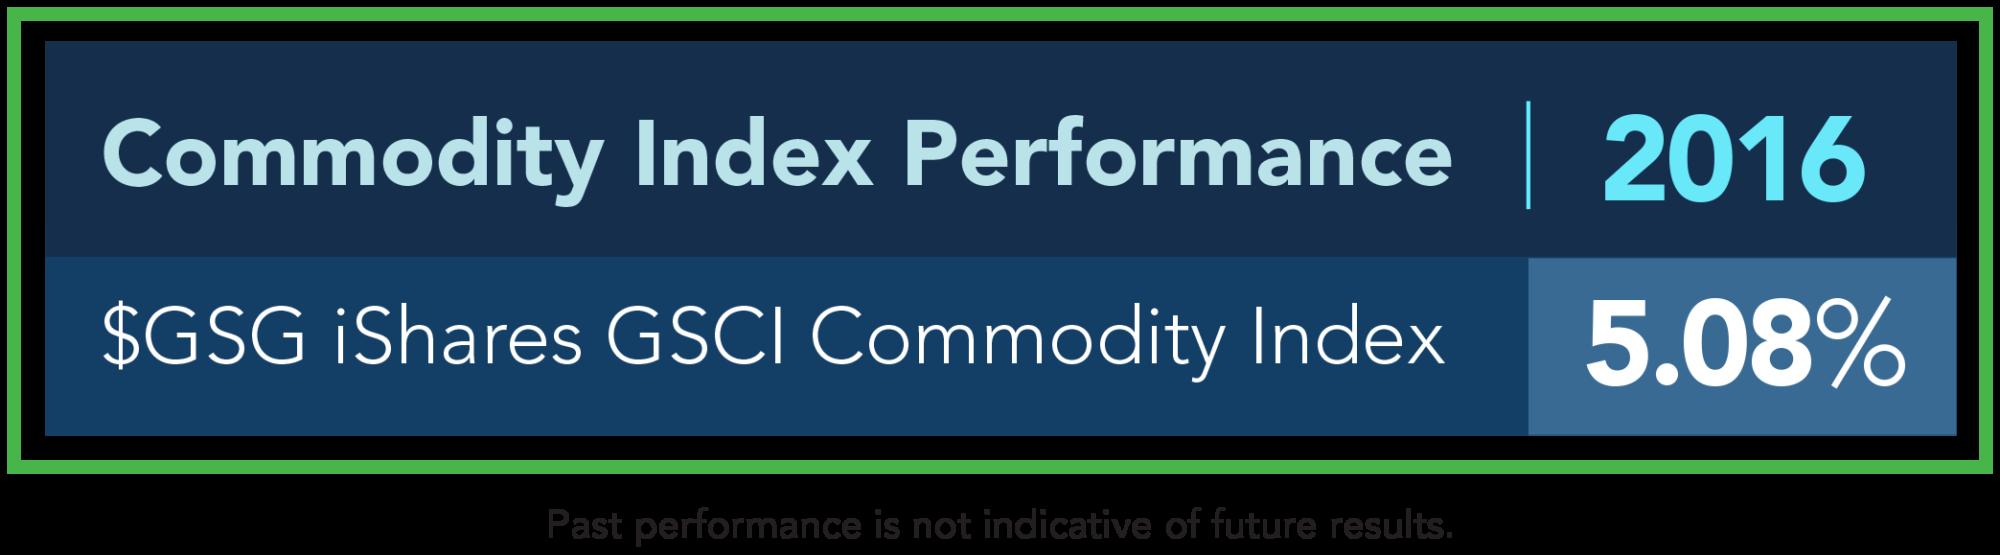 commodities_performance_1